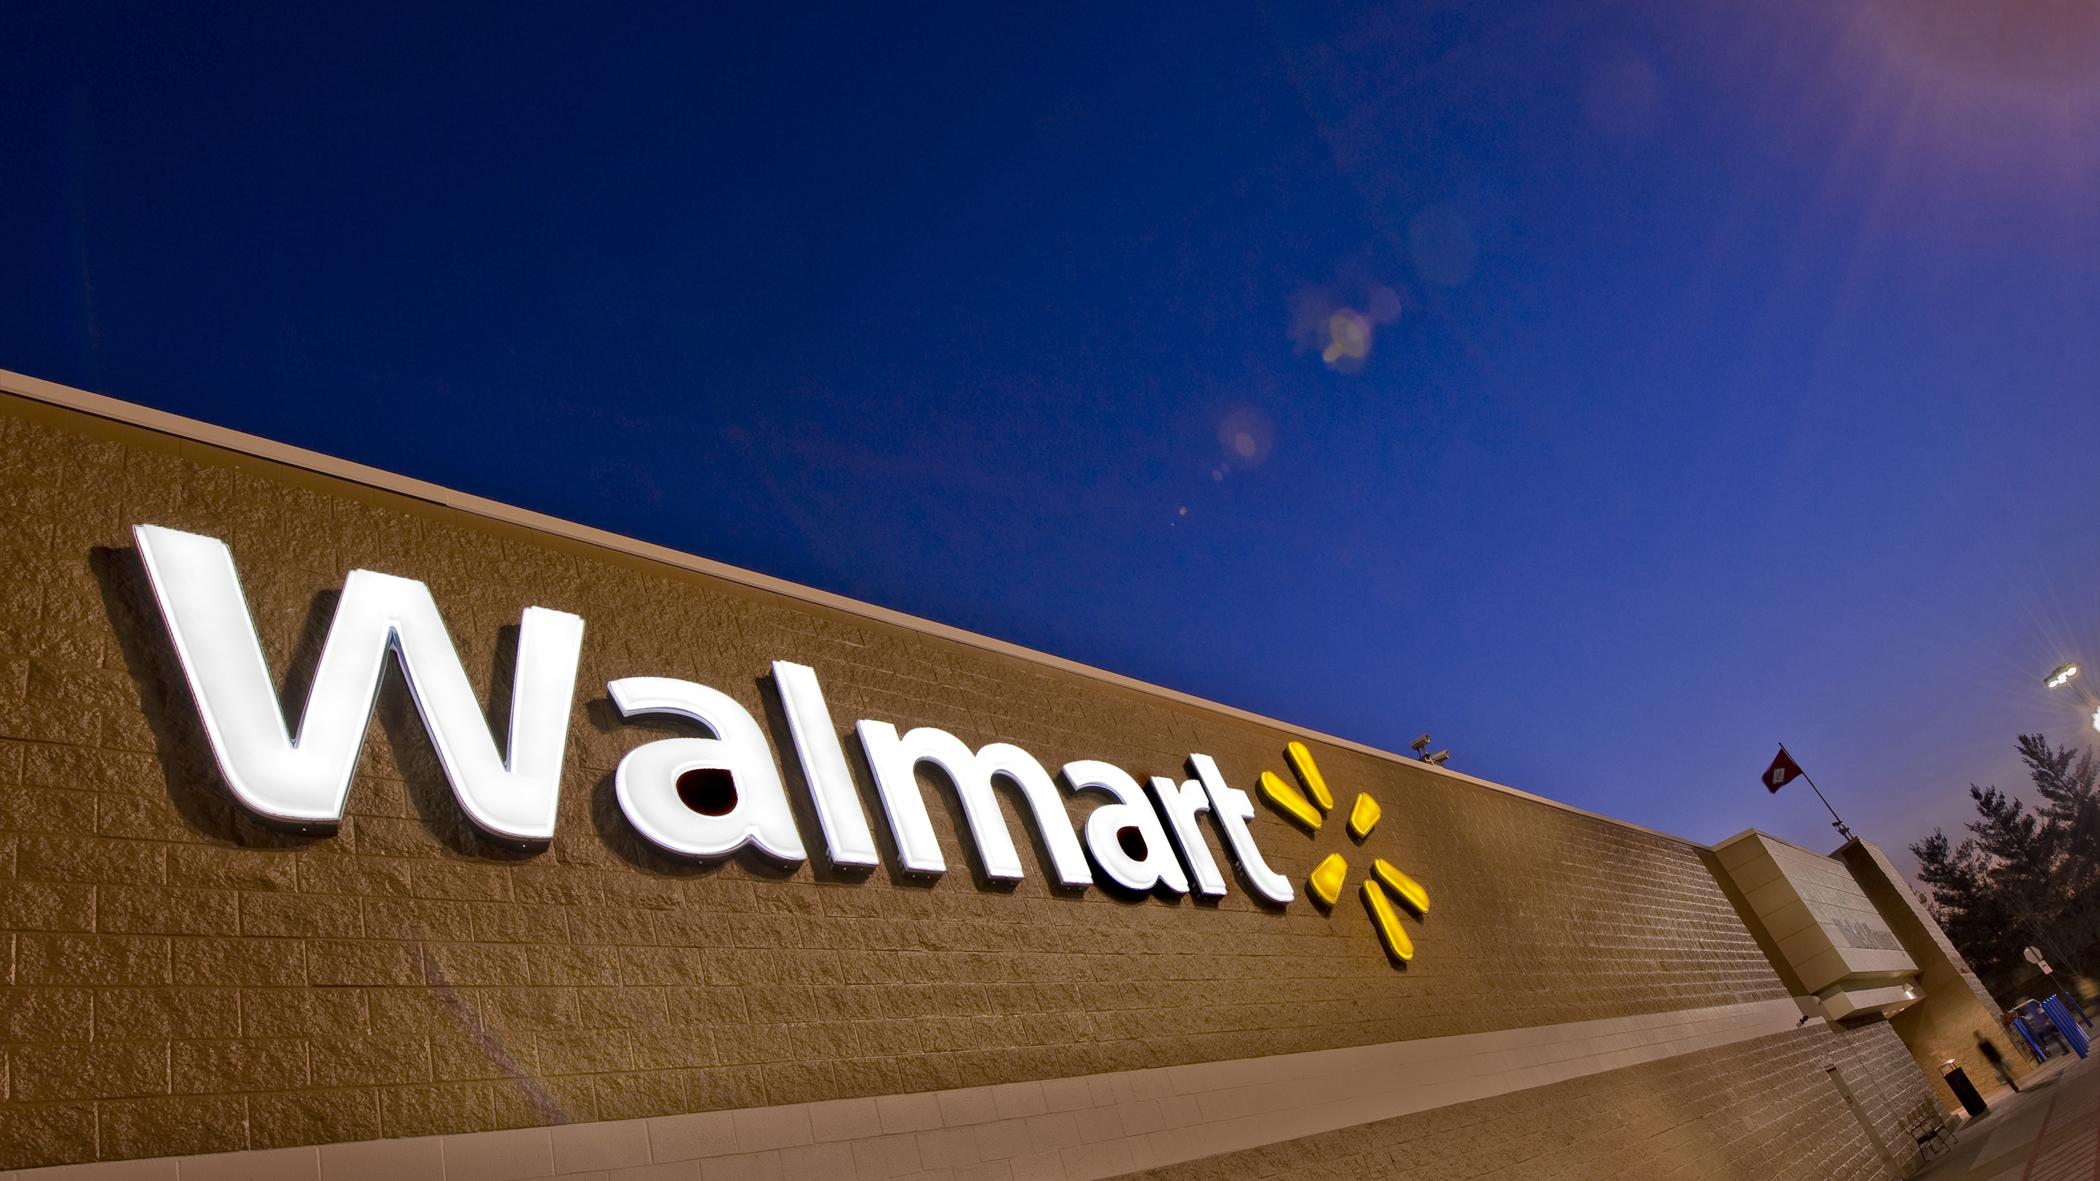 walmart storefront_1559913736248.jpg-60106293-60106293.jpg